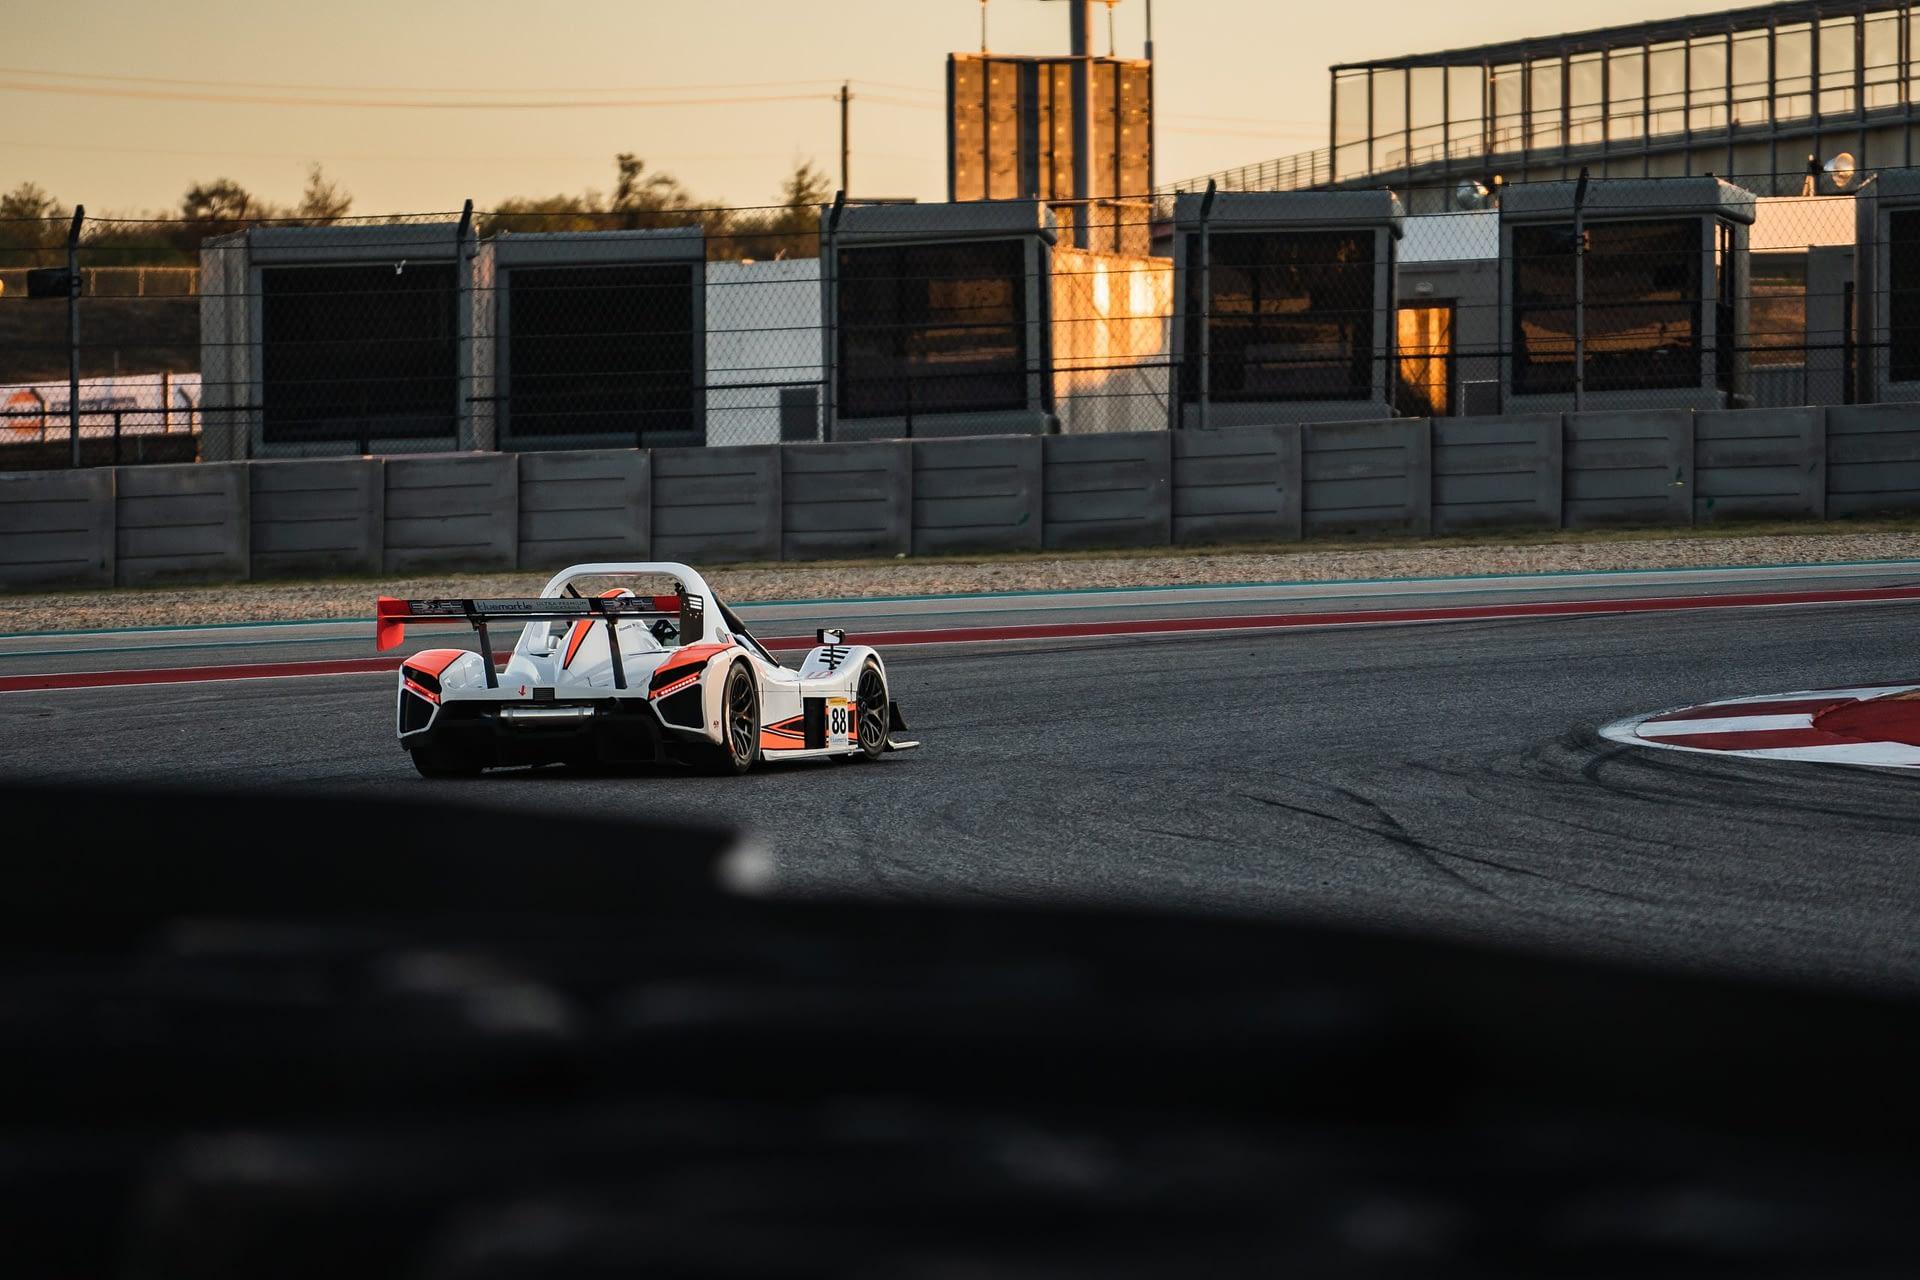 Radical sr8, radical sr3, race car rental, radical rental